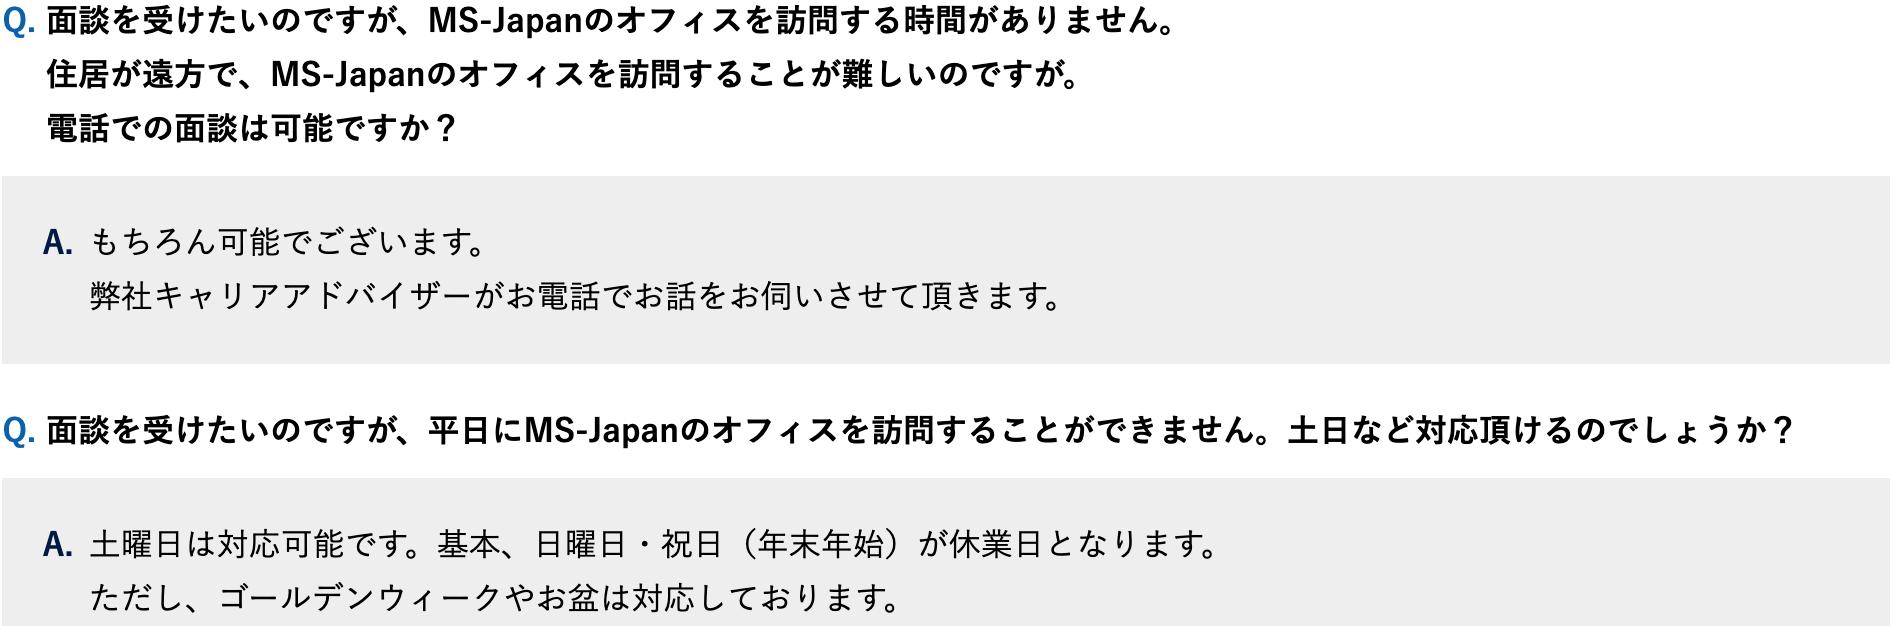 MS-Japan 面談場所 面談時間